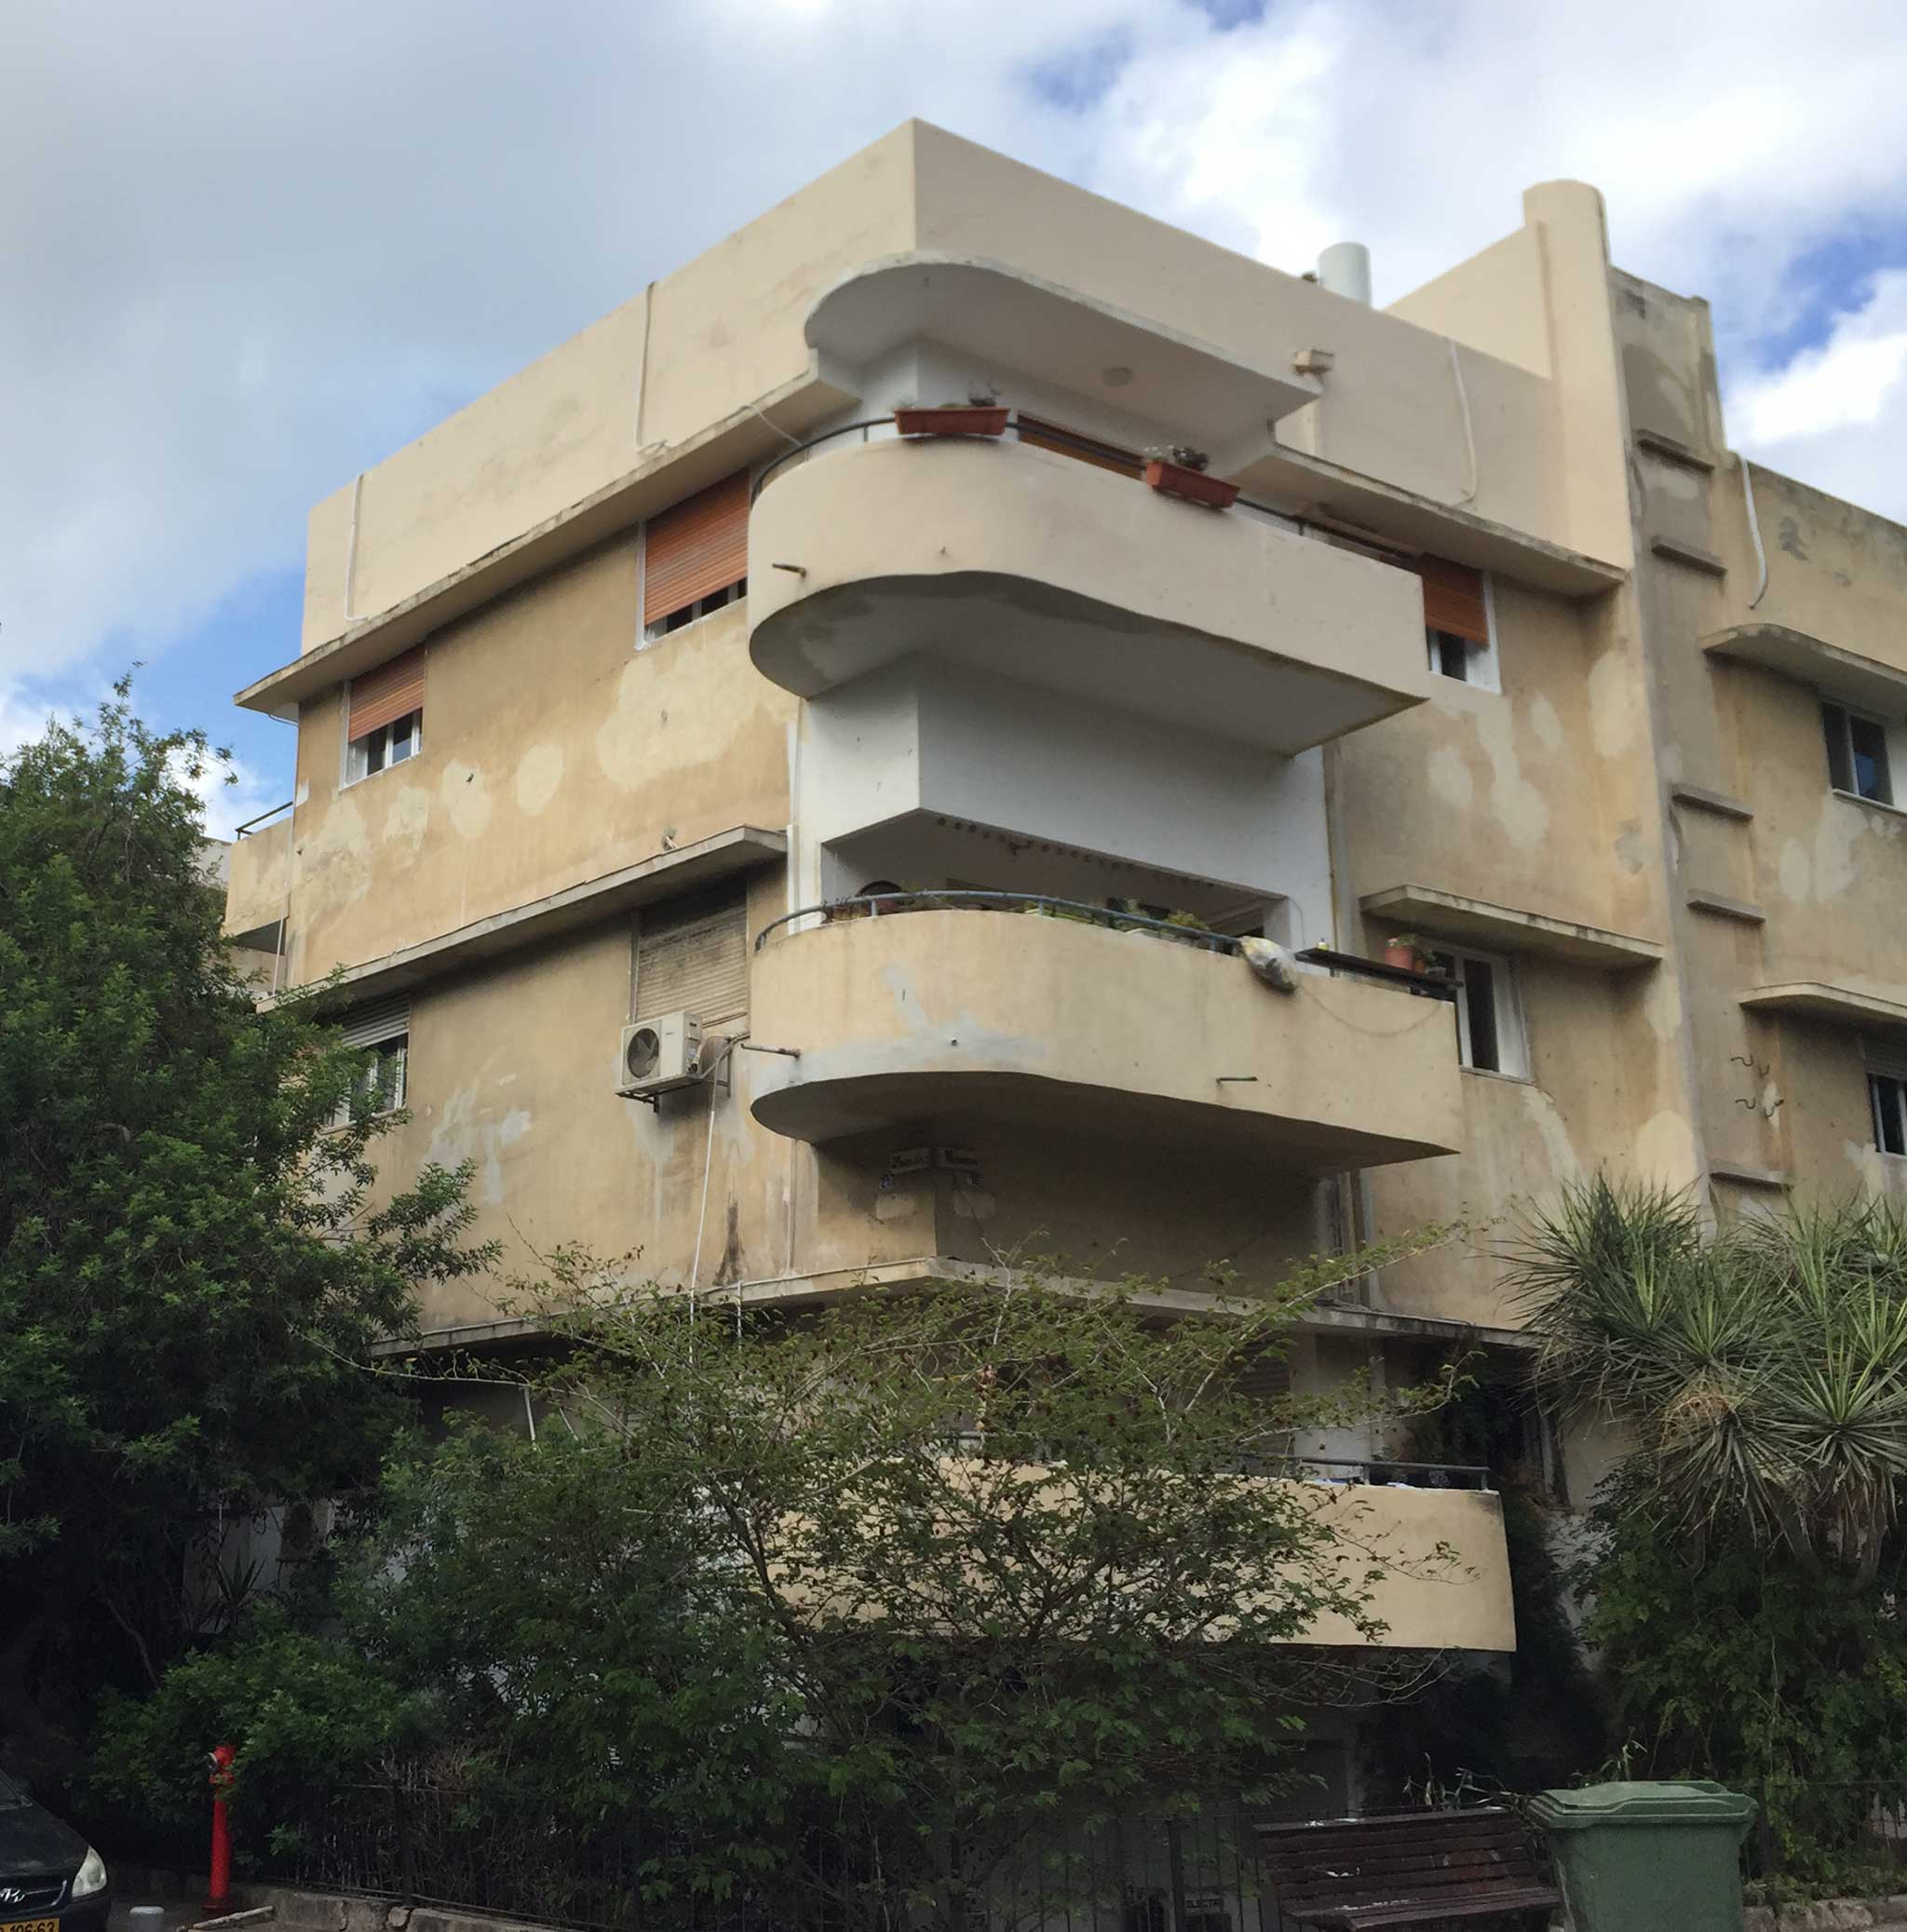 HaBima Theatre Houses on Tel Aviv audio tour The White City